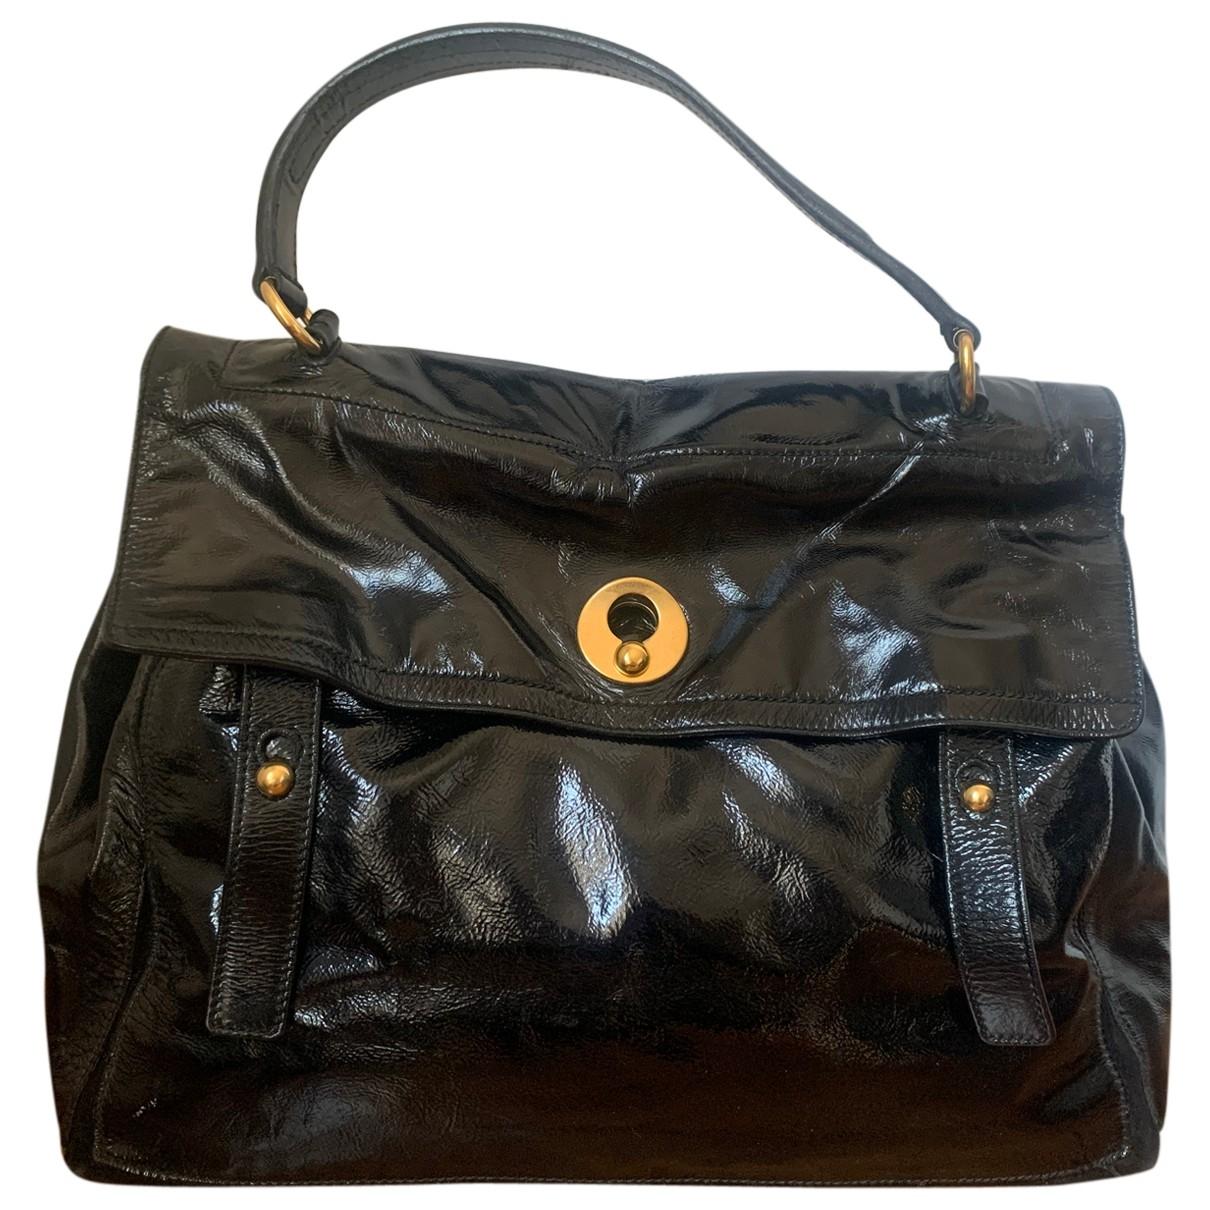 Yves Saint Laurent Muse Two Handtasche in  Schwarz Lackleder